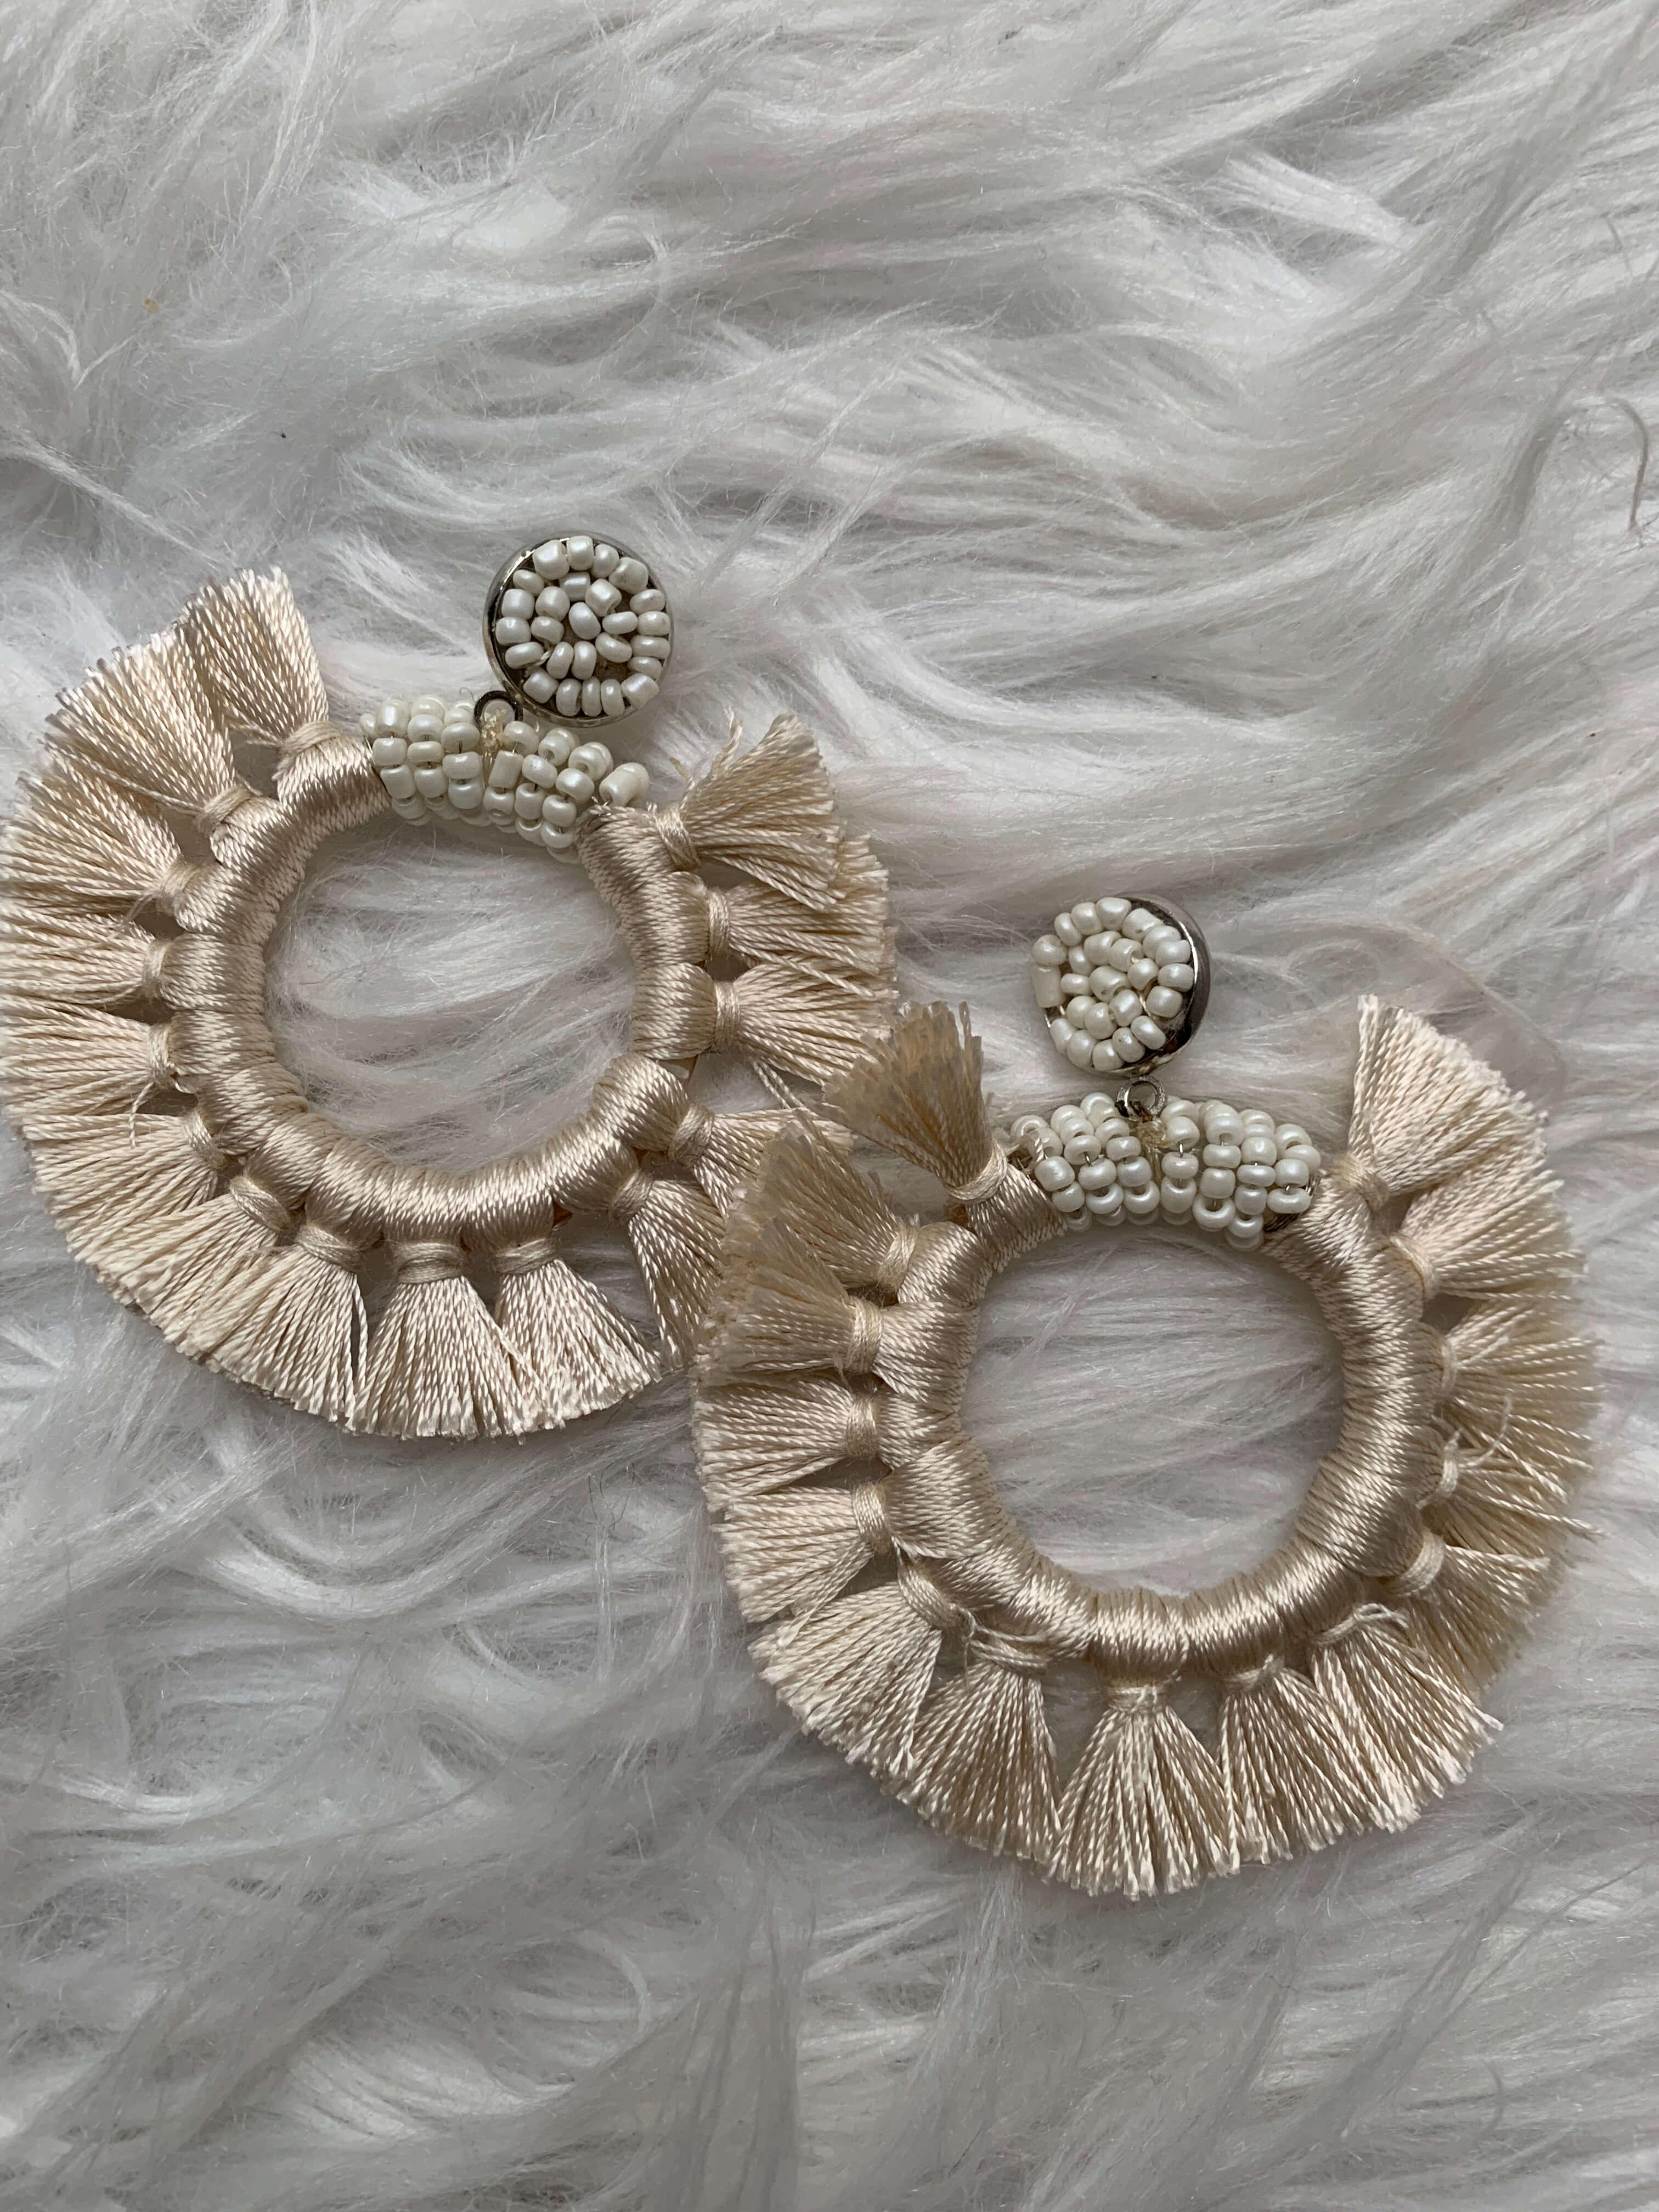 Amazon Fashion Haul | raitassel earrings | Style Your Senses